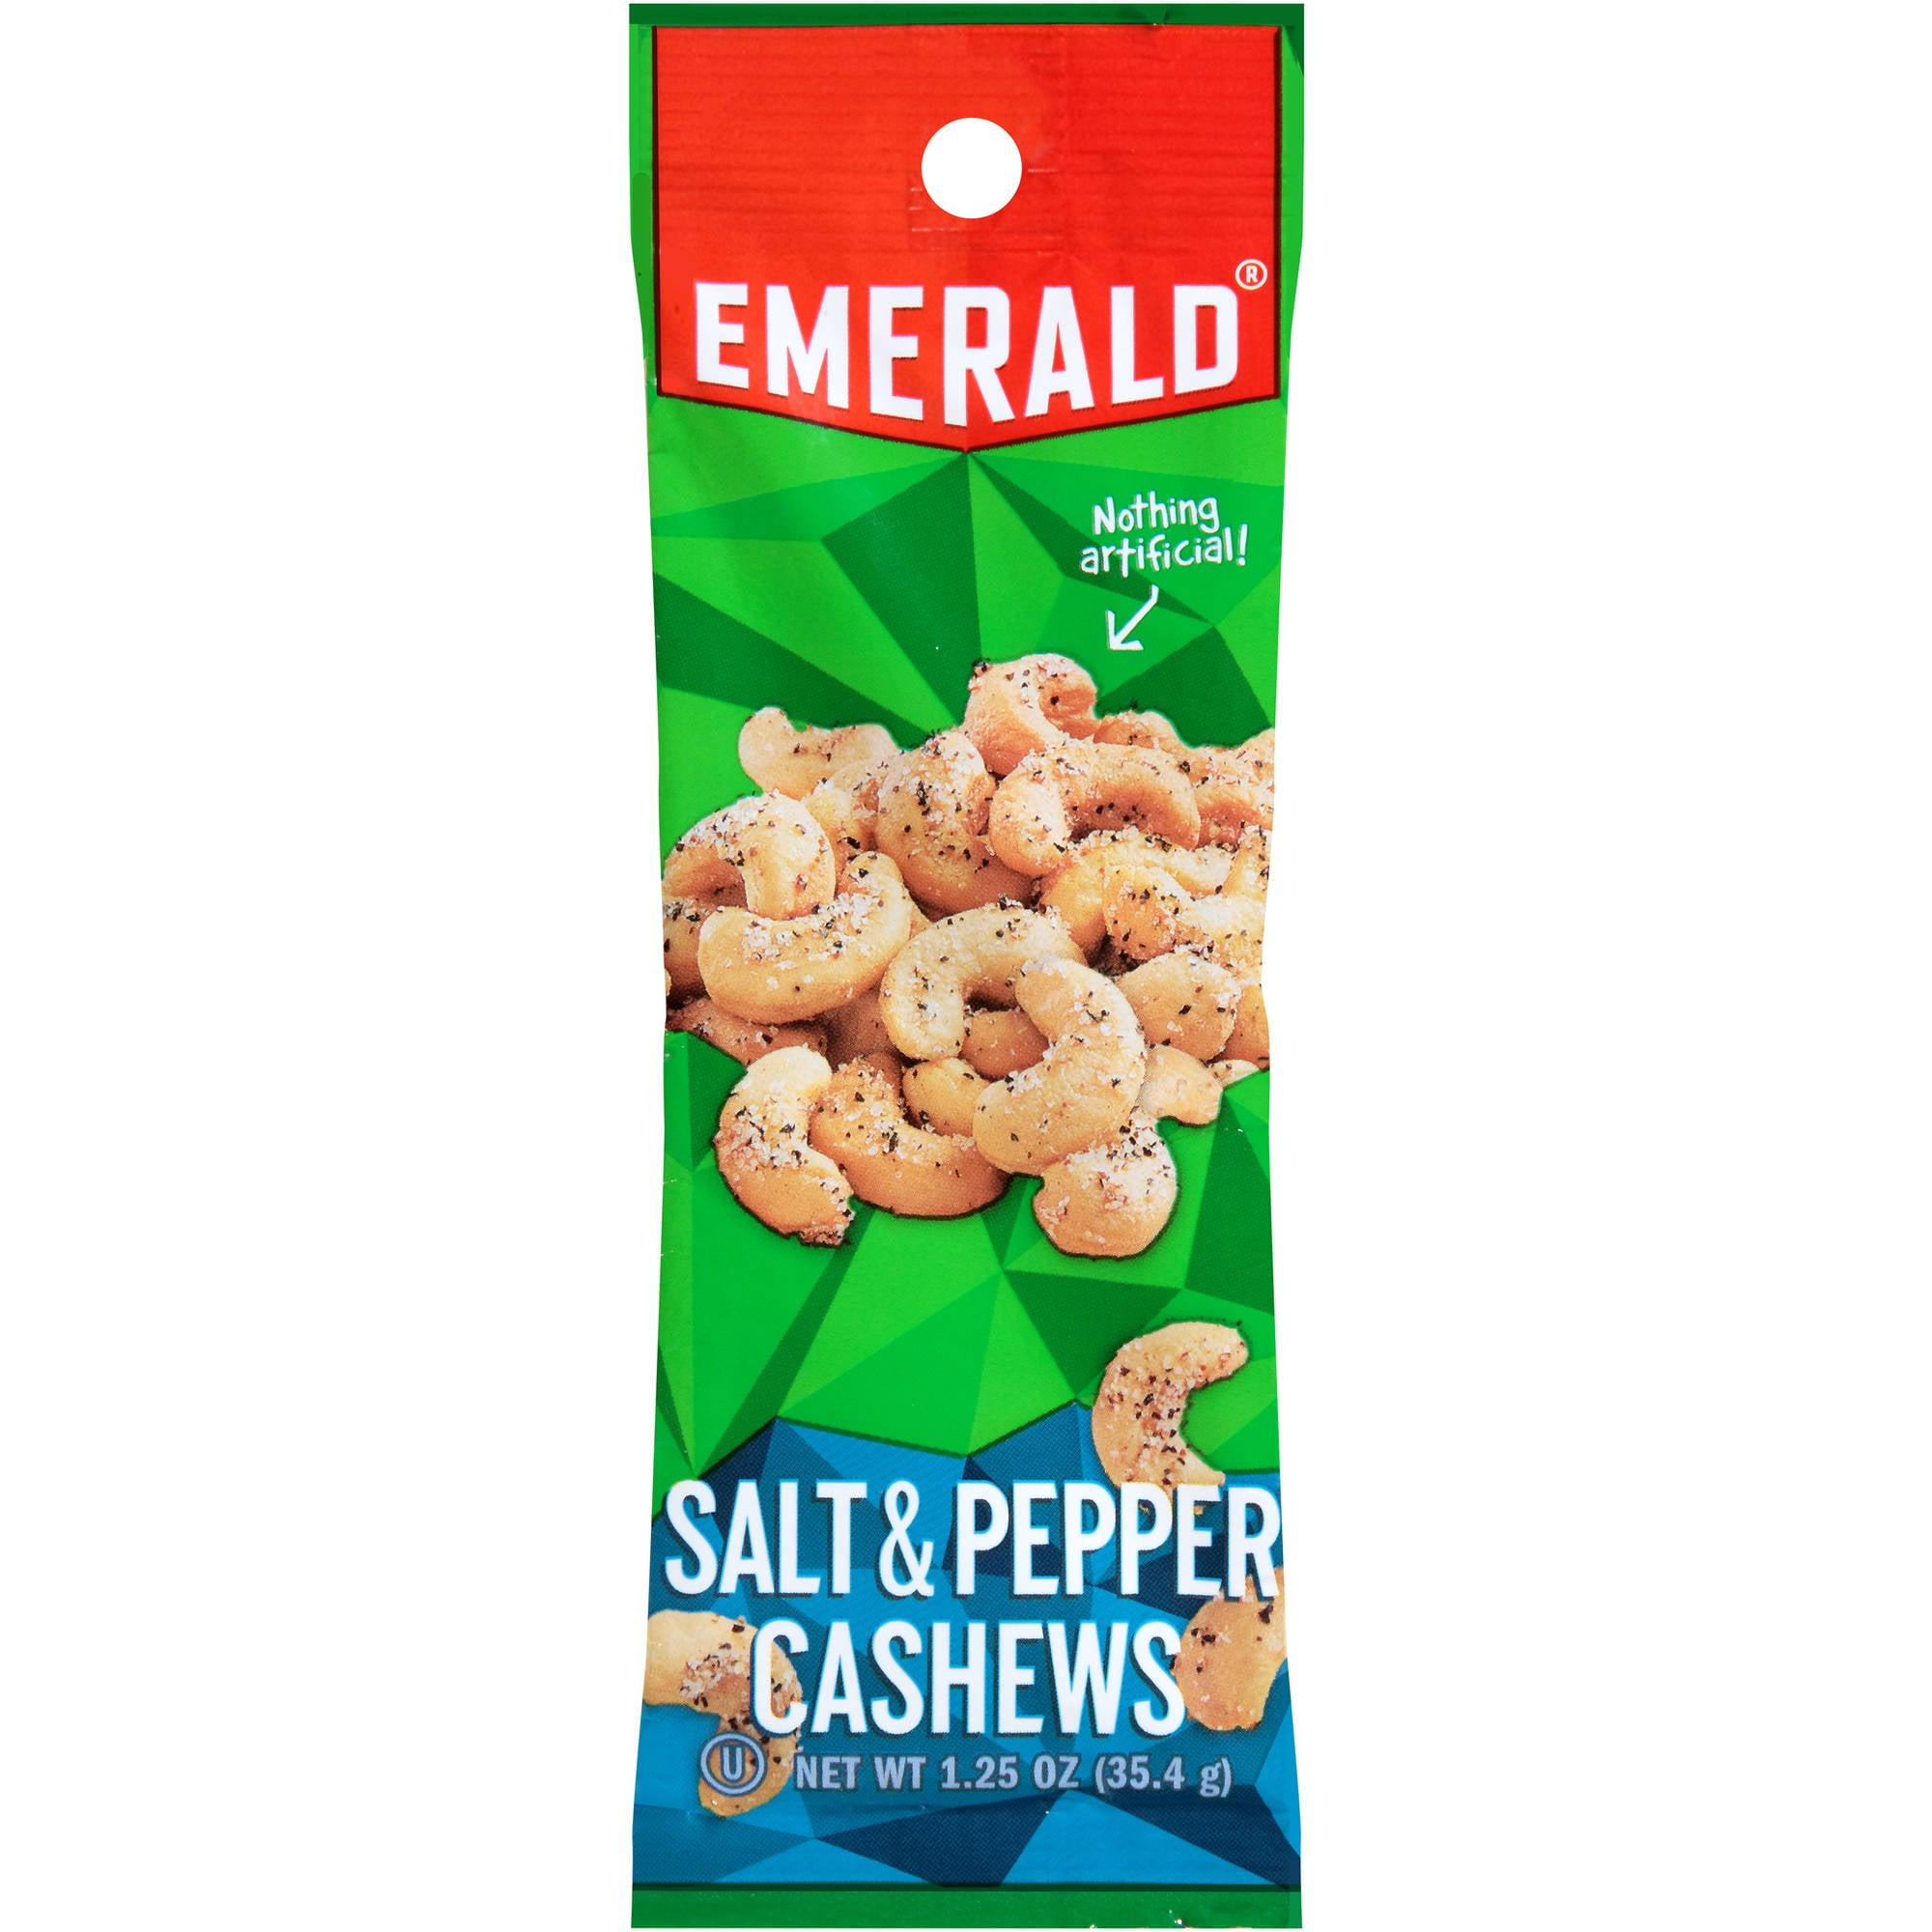 Emerald Sea Salt and Pepper Cashews, 1.25 oz. Tube Package, 12 Box by Diamond Foods